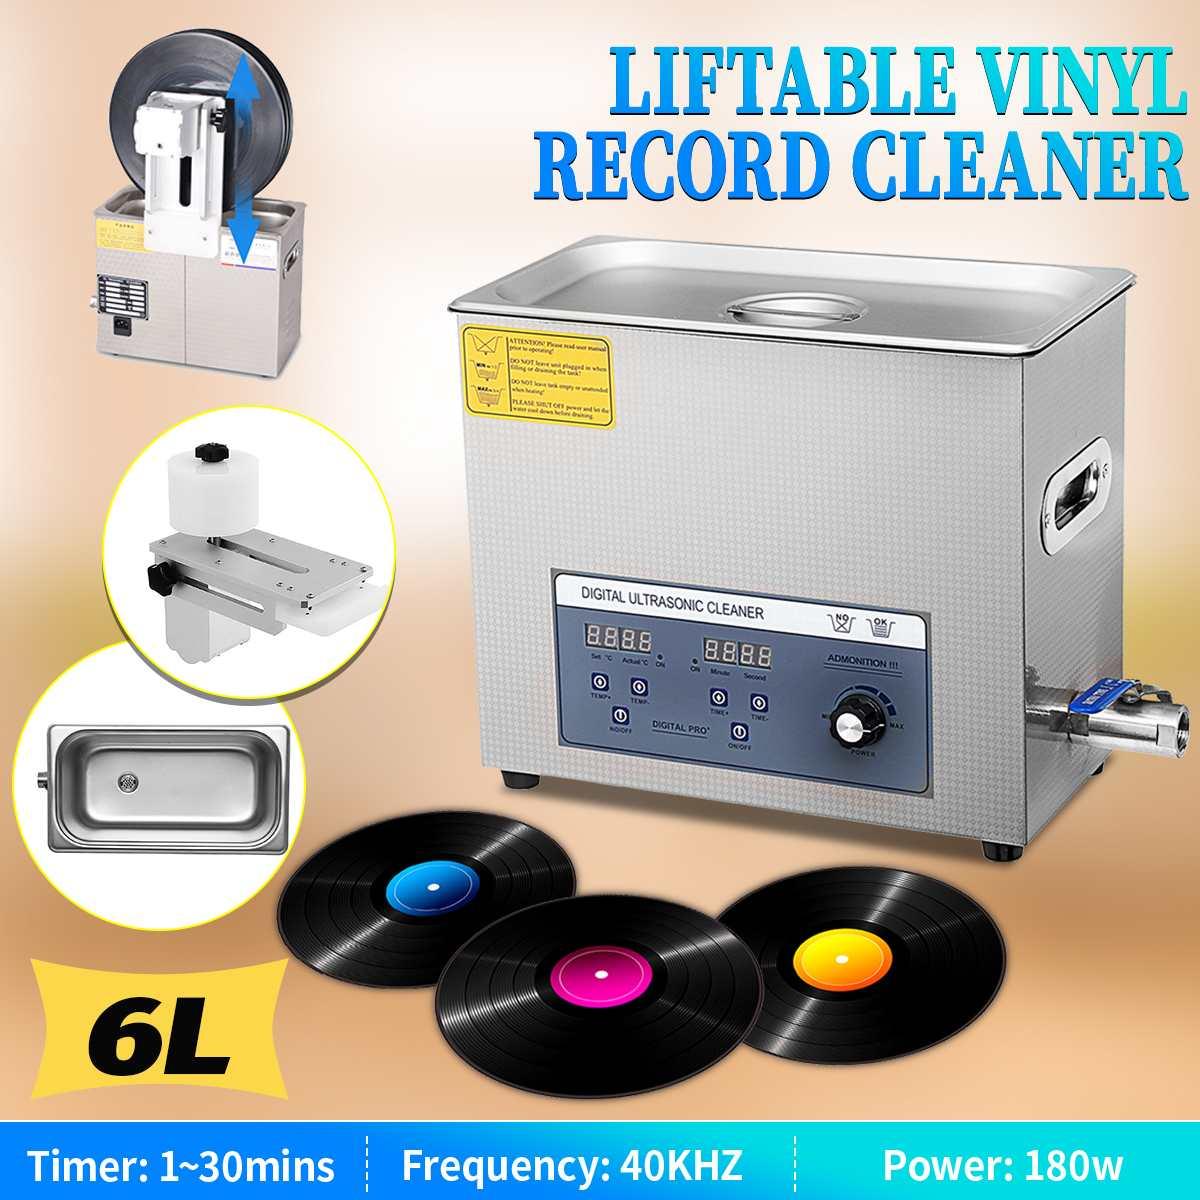 Profissional de 6l 220 v liftable lp álbum disco digital ultra sônico mais limpo vinil registro lavagem ultra som máquina limpeza portátil